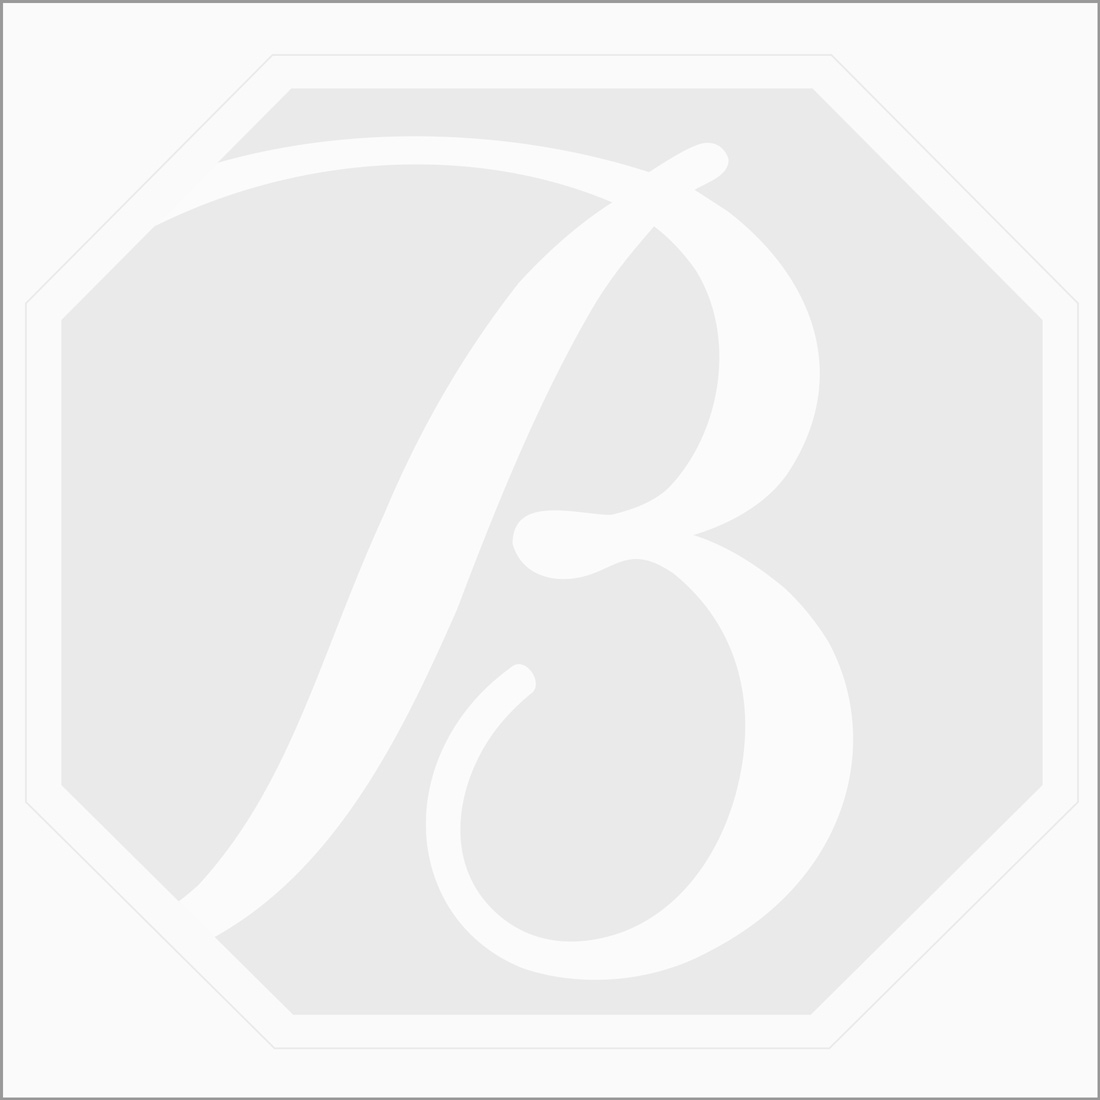 50 x 30 mm - Watermelon (Bi-Color) Tourmaline Carving - 180.00 carats (ToCarv1011)